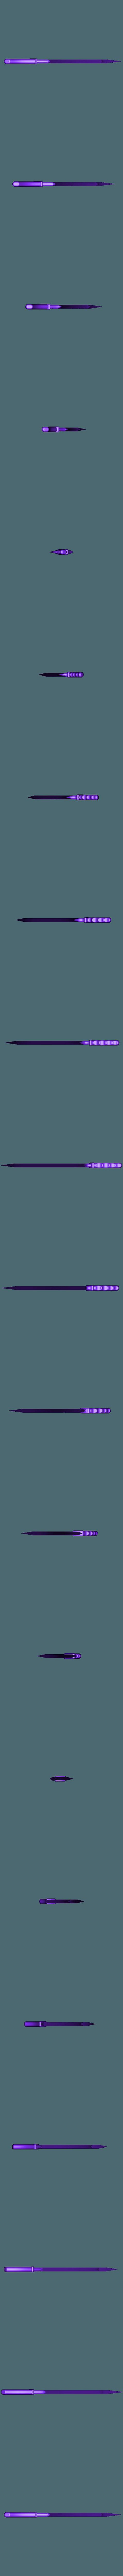 Cimeterre_fullsize.stl Download free STL file Cosplay Machete • 3D printable object, Valelab3D